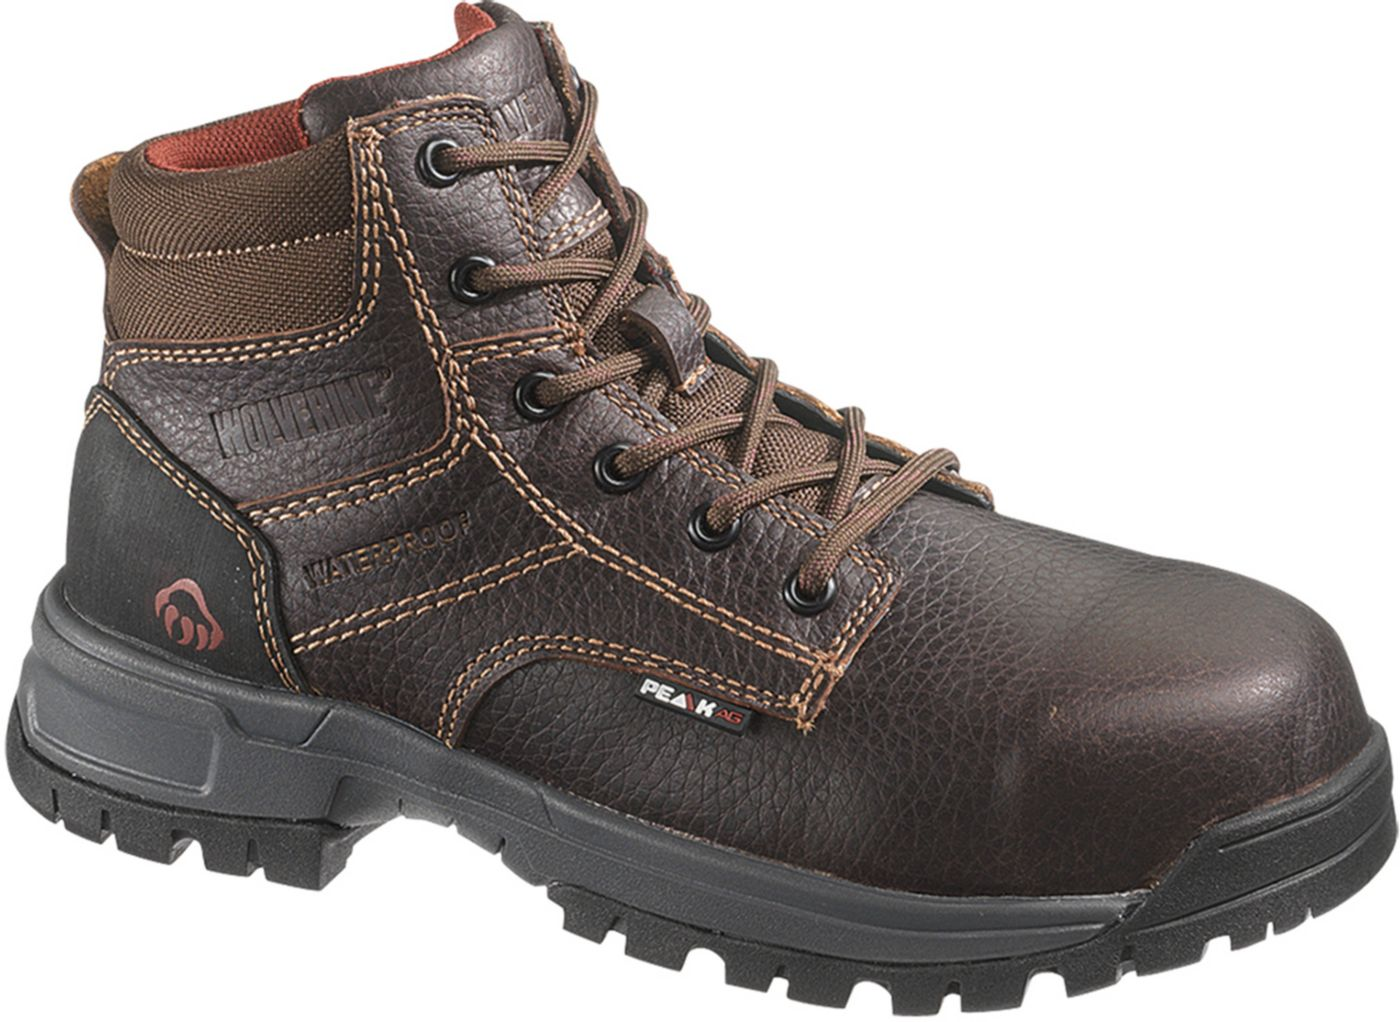 "Wolverine Women's Piper 6"" Waterproof Composite Toe Work Boots"